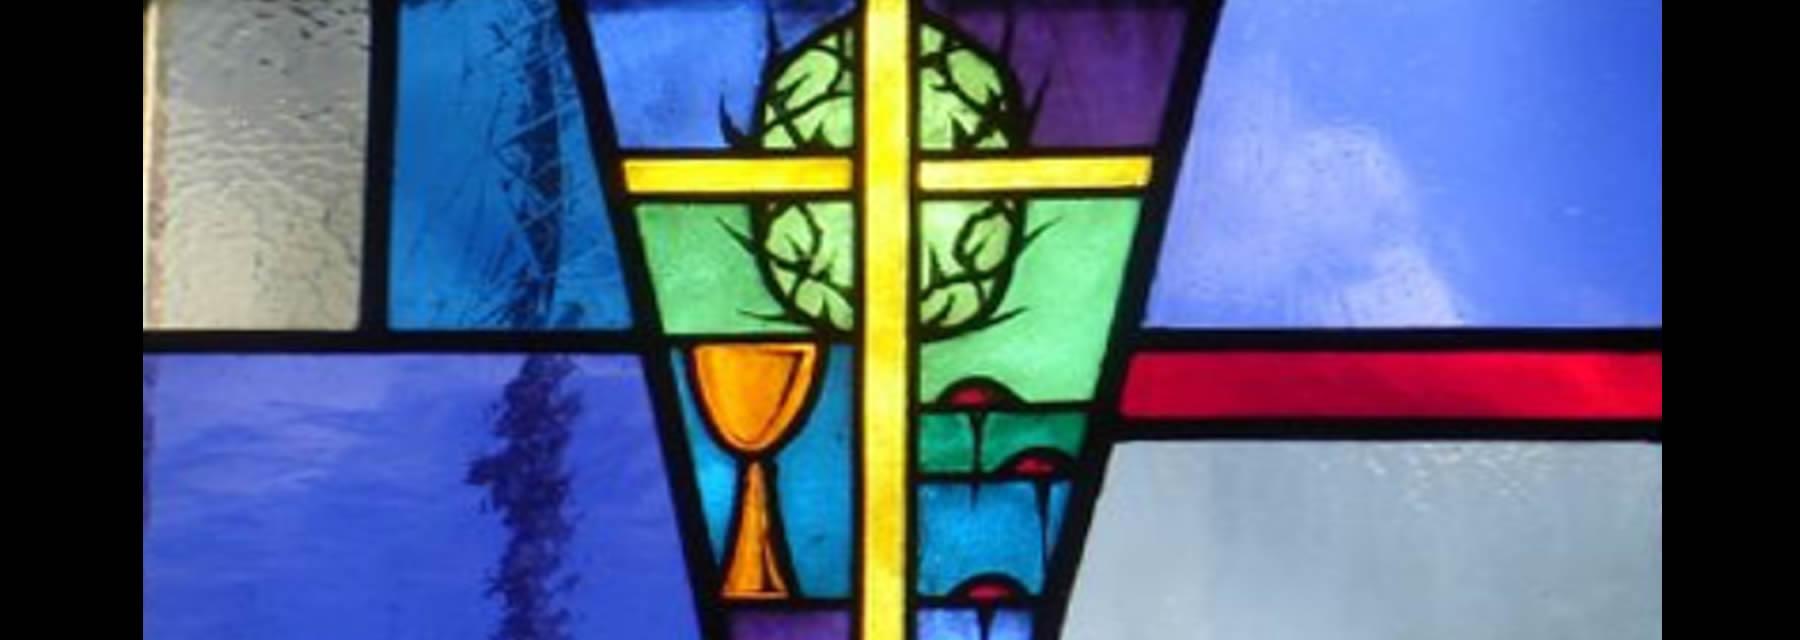 Holy Cross Lutheran Church, O'Fallon, Missouri